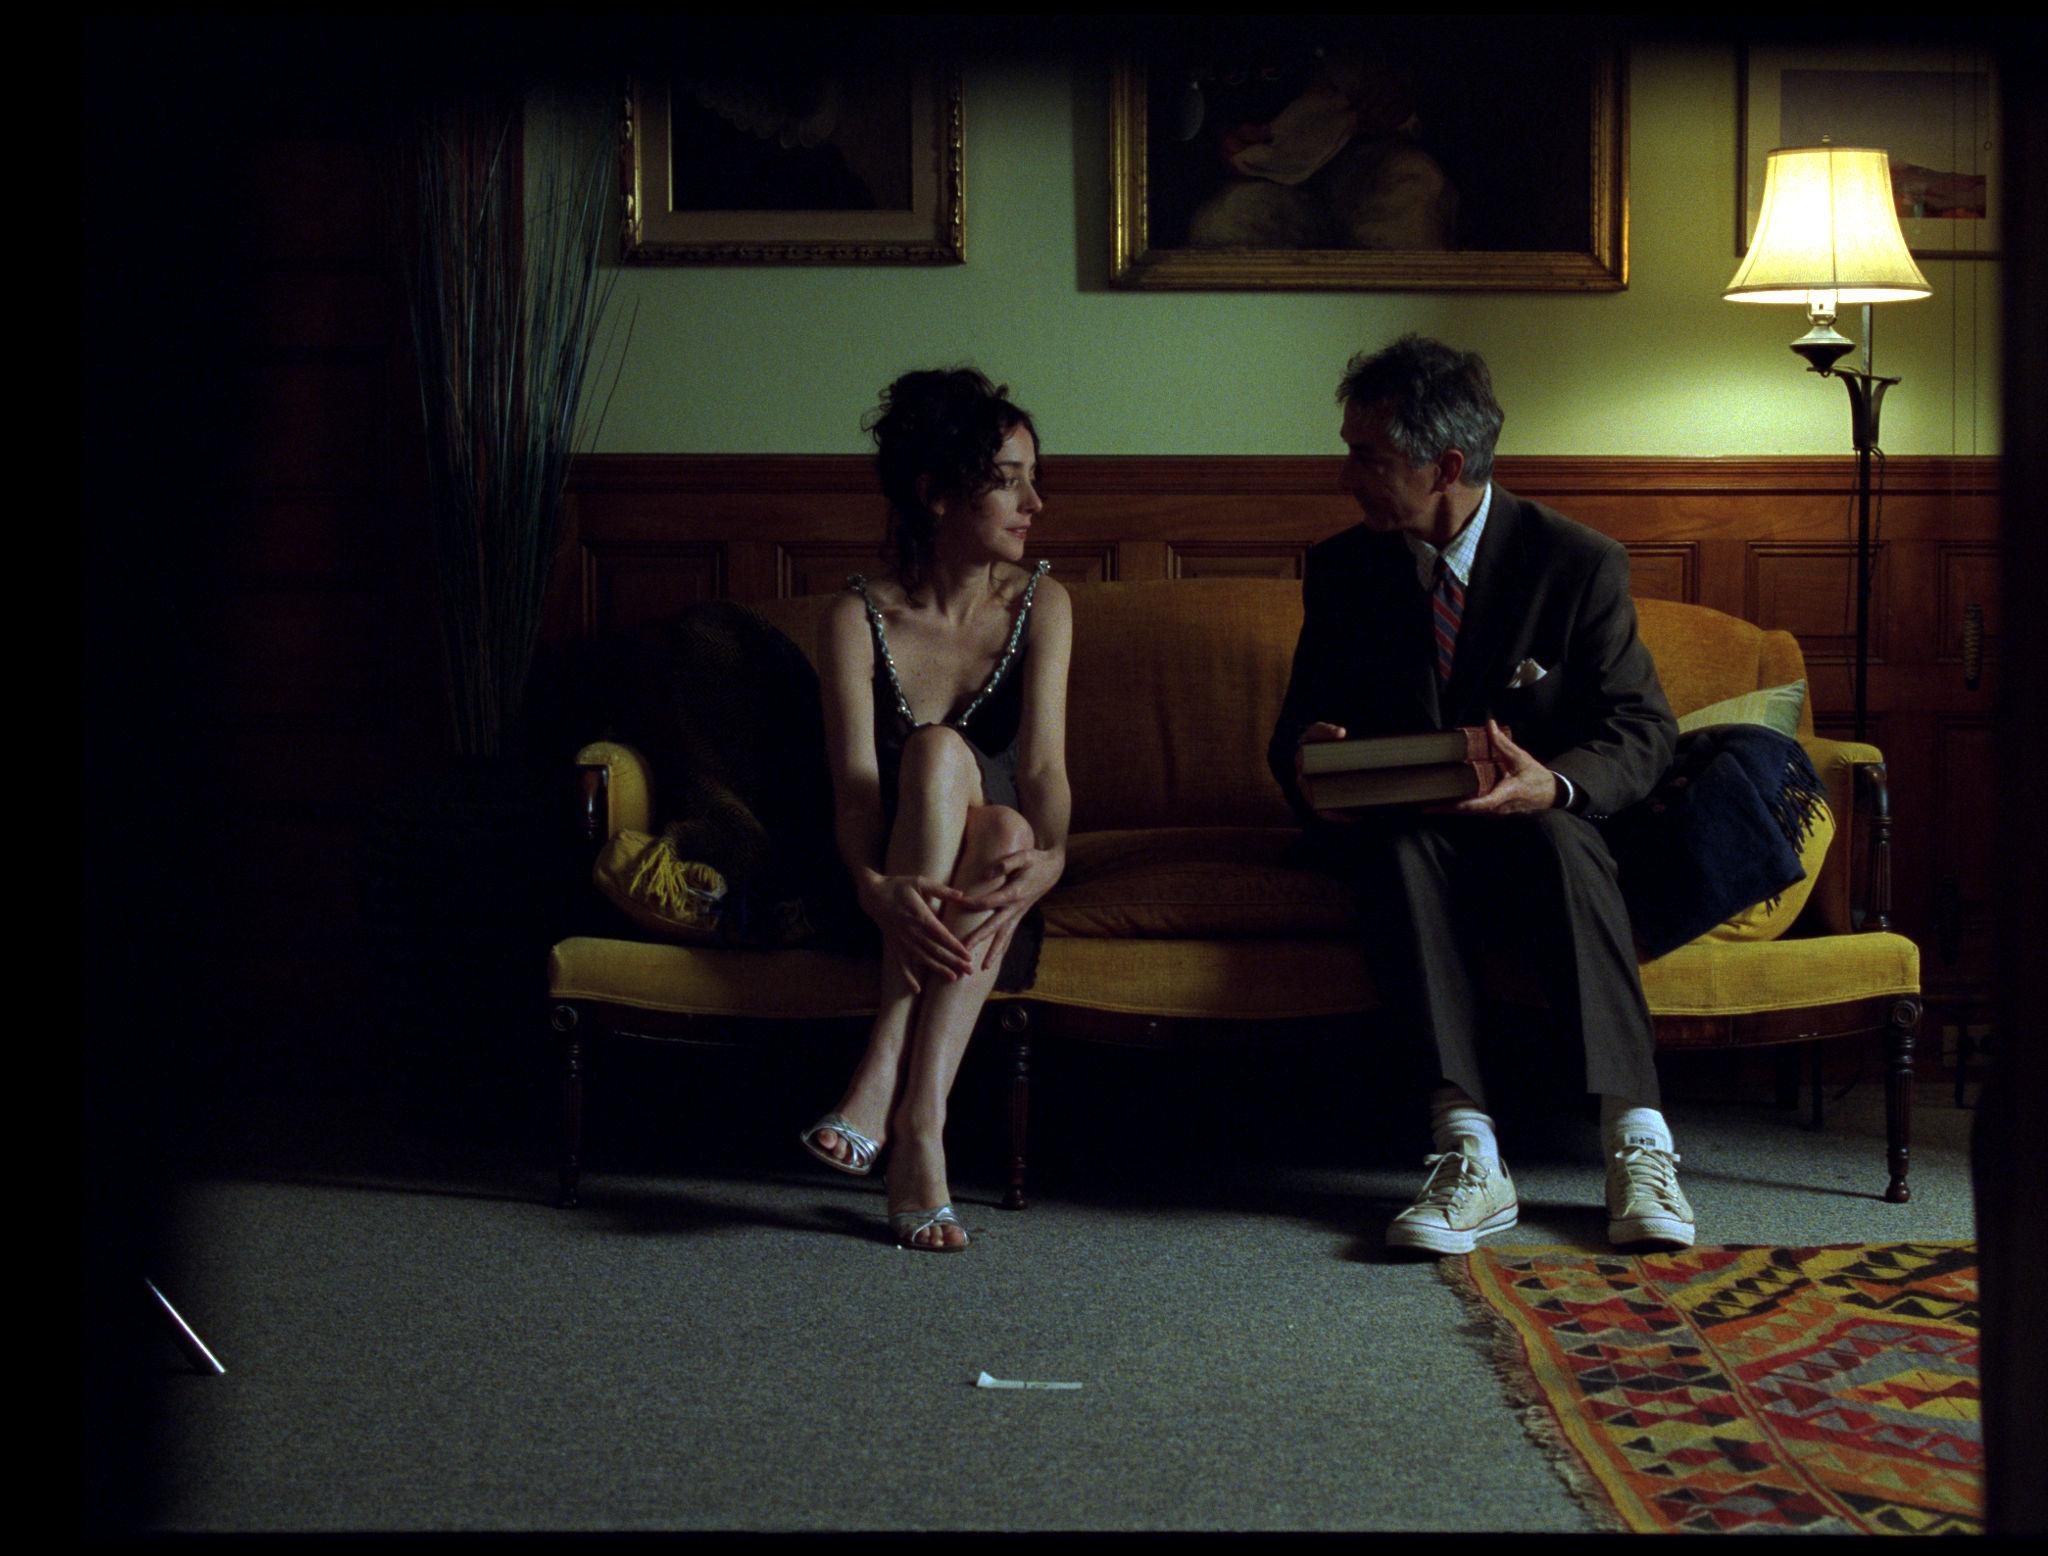 Jane Adams and David Strathairn